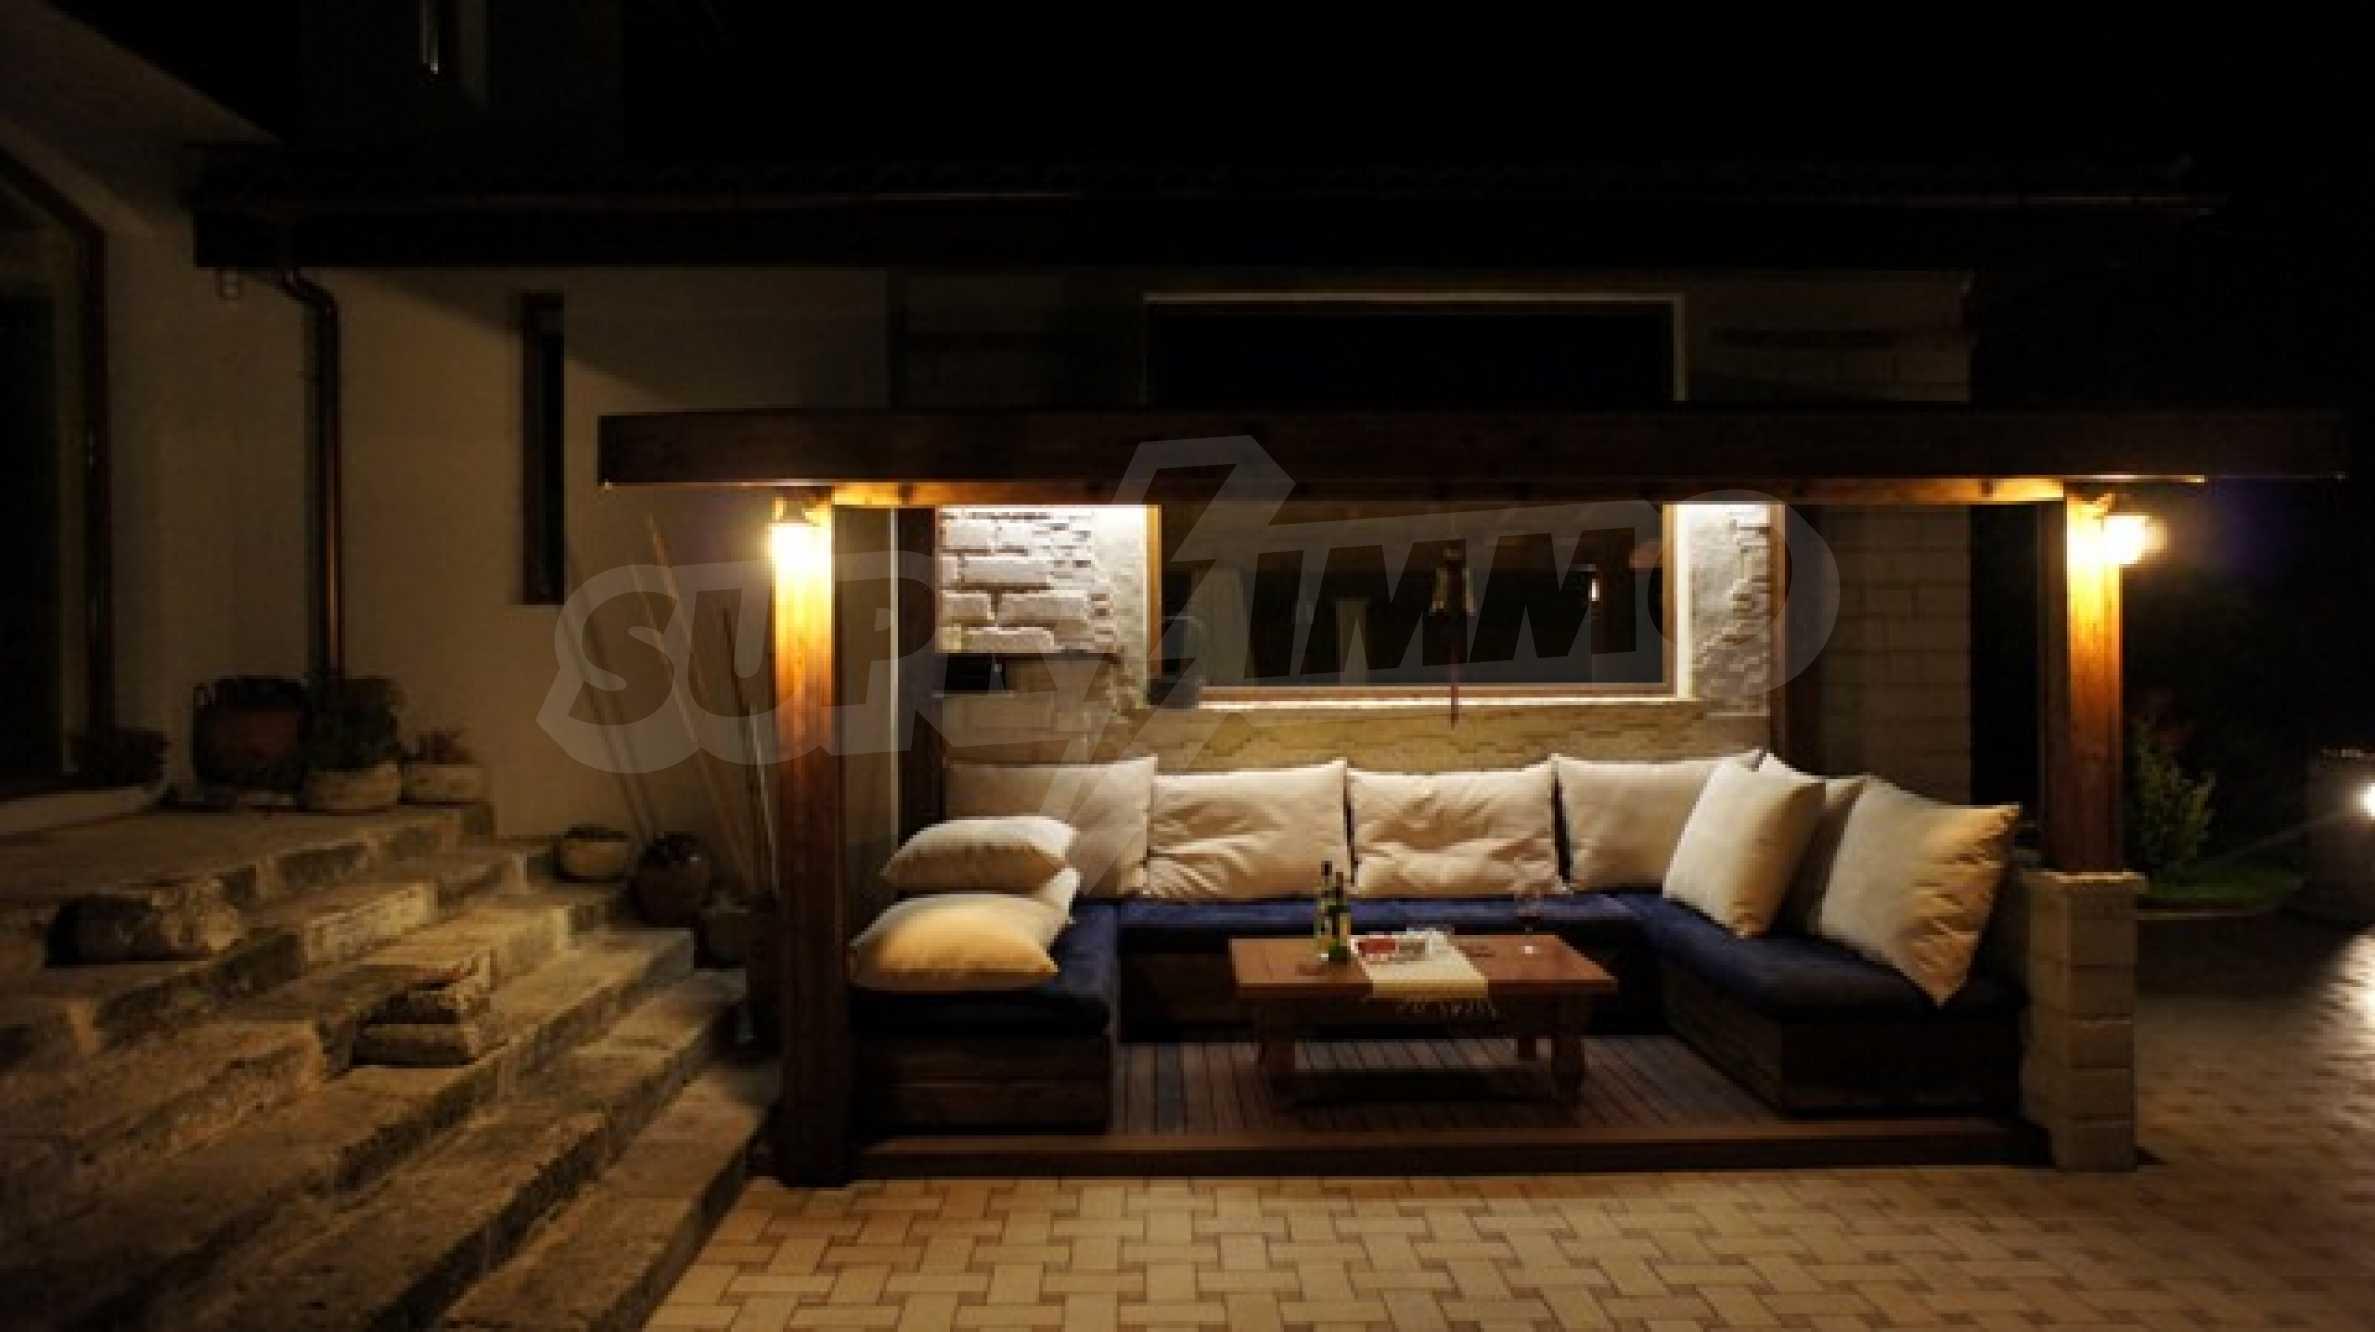 The Mediterranean style - a sense of luxury 59